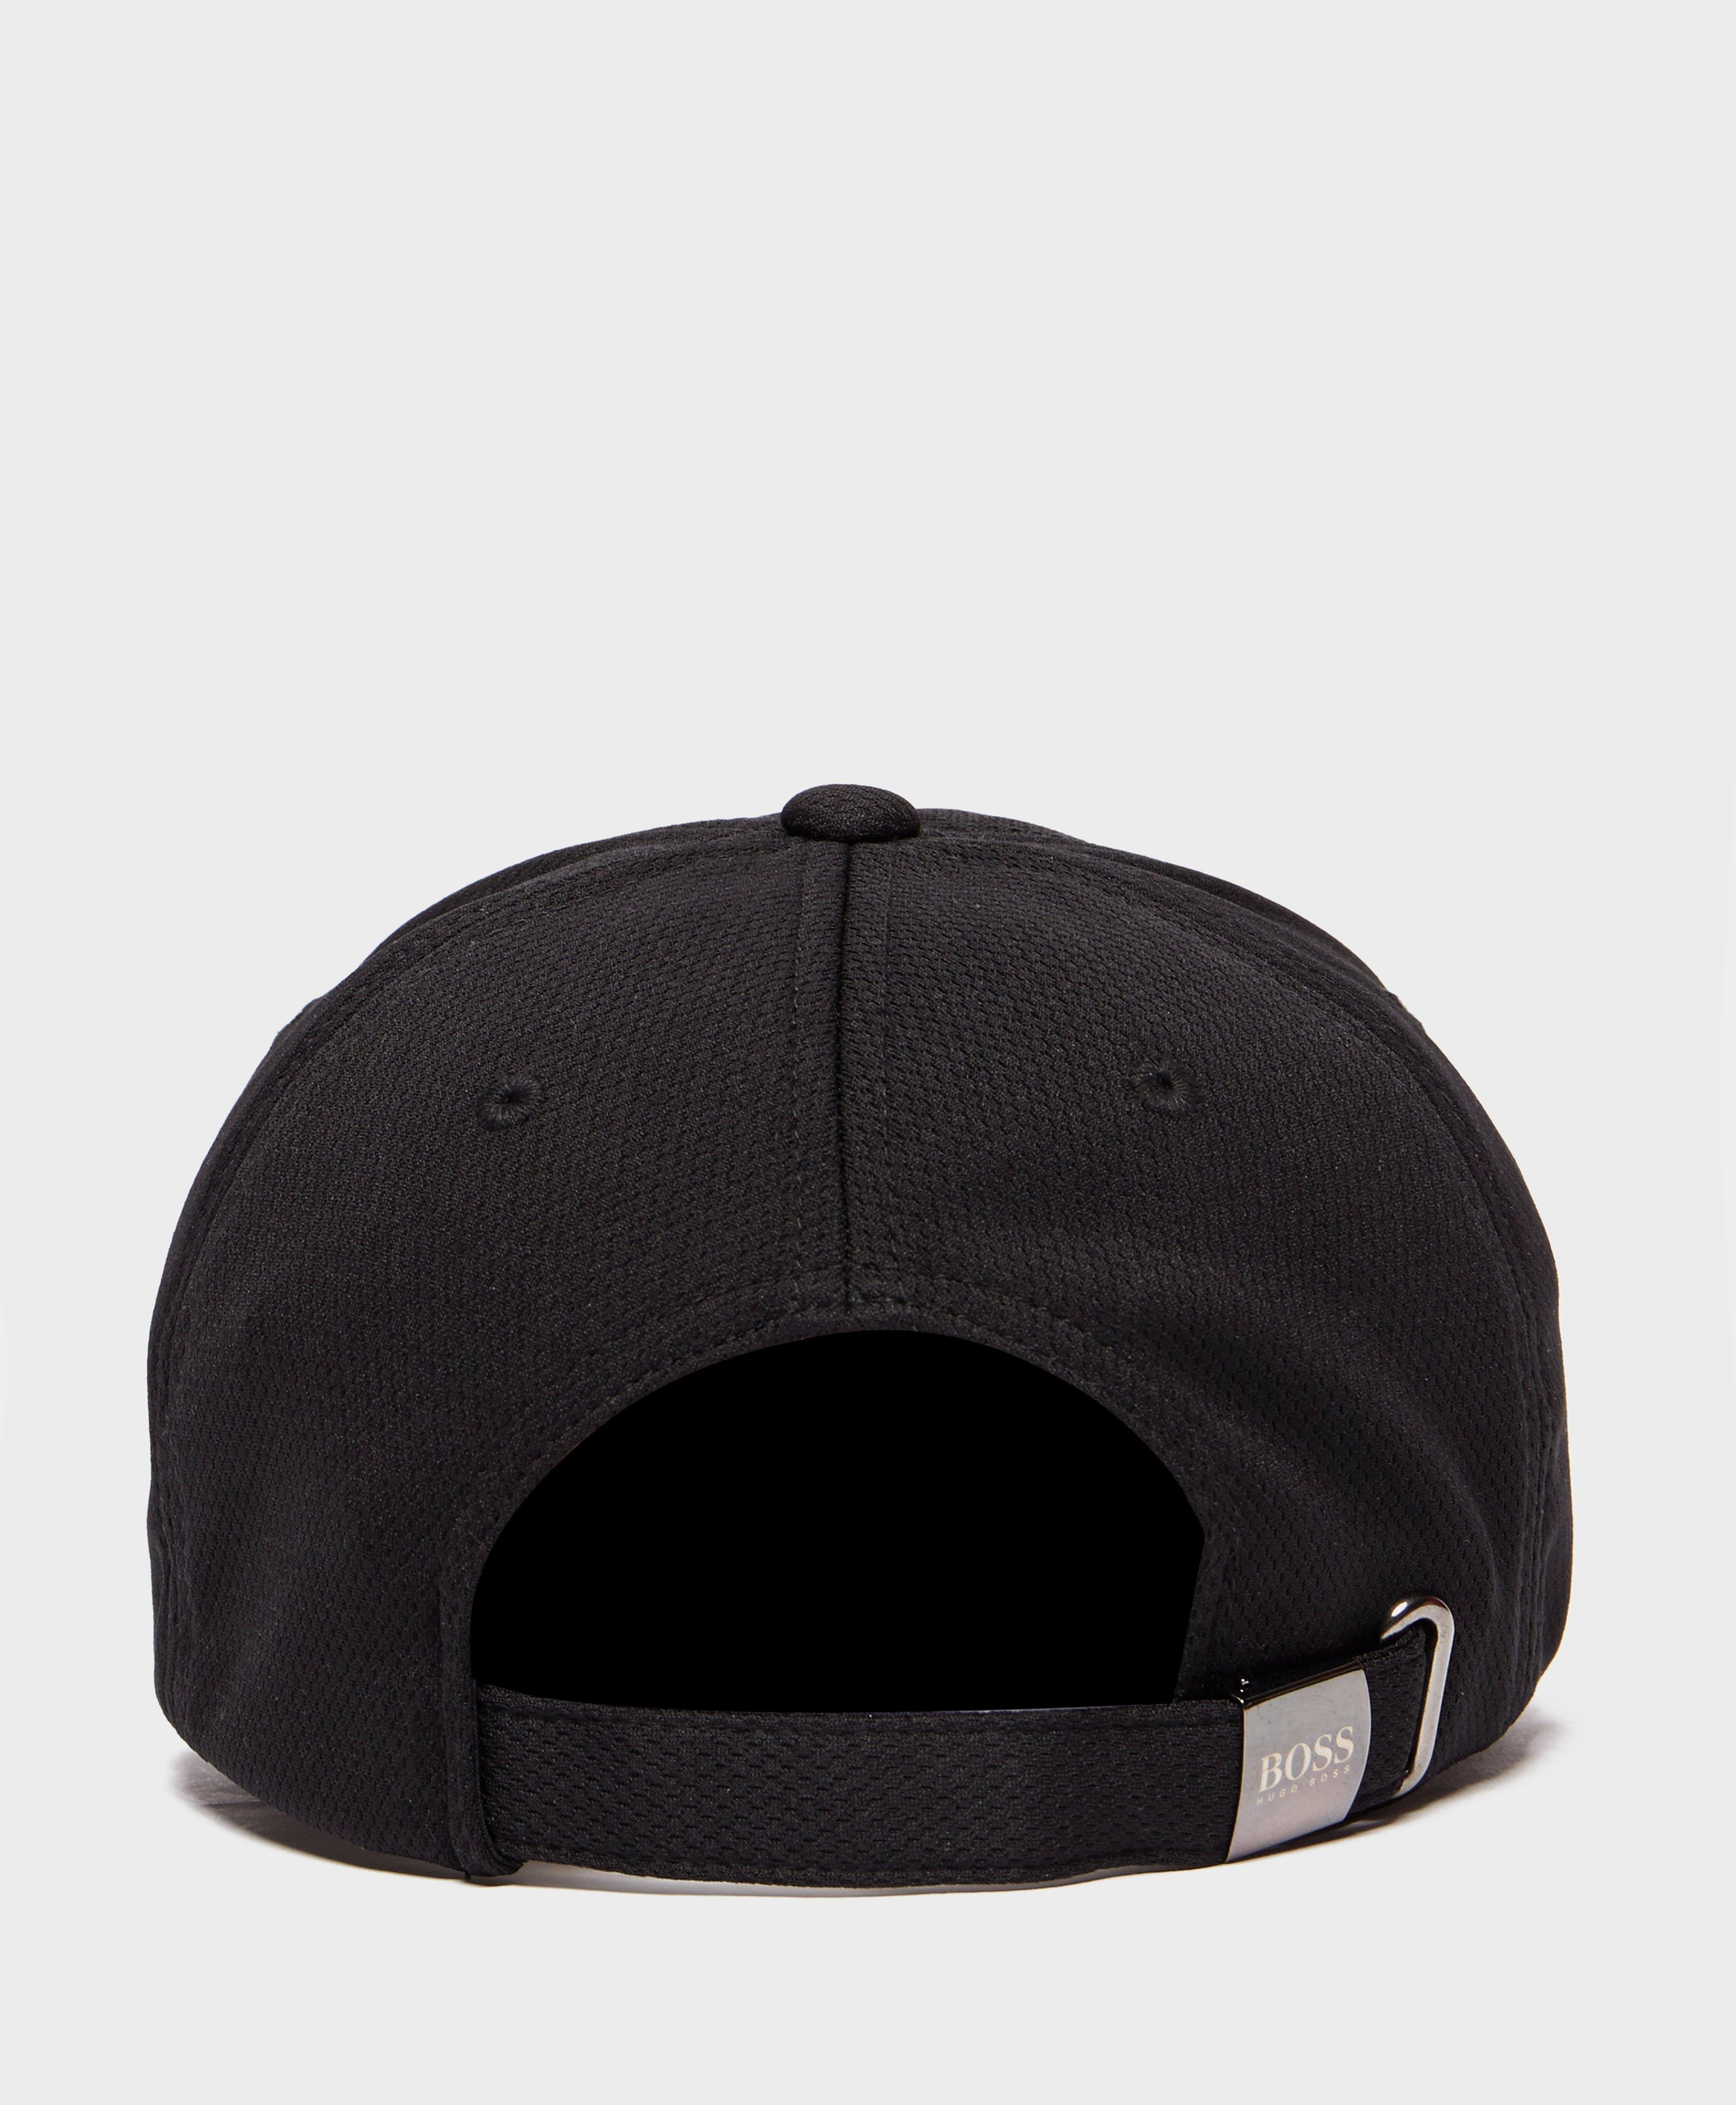 ef6d3cb79dc Lyst - BOSS Poly Print Cap in Black for Men